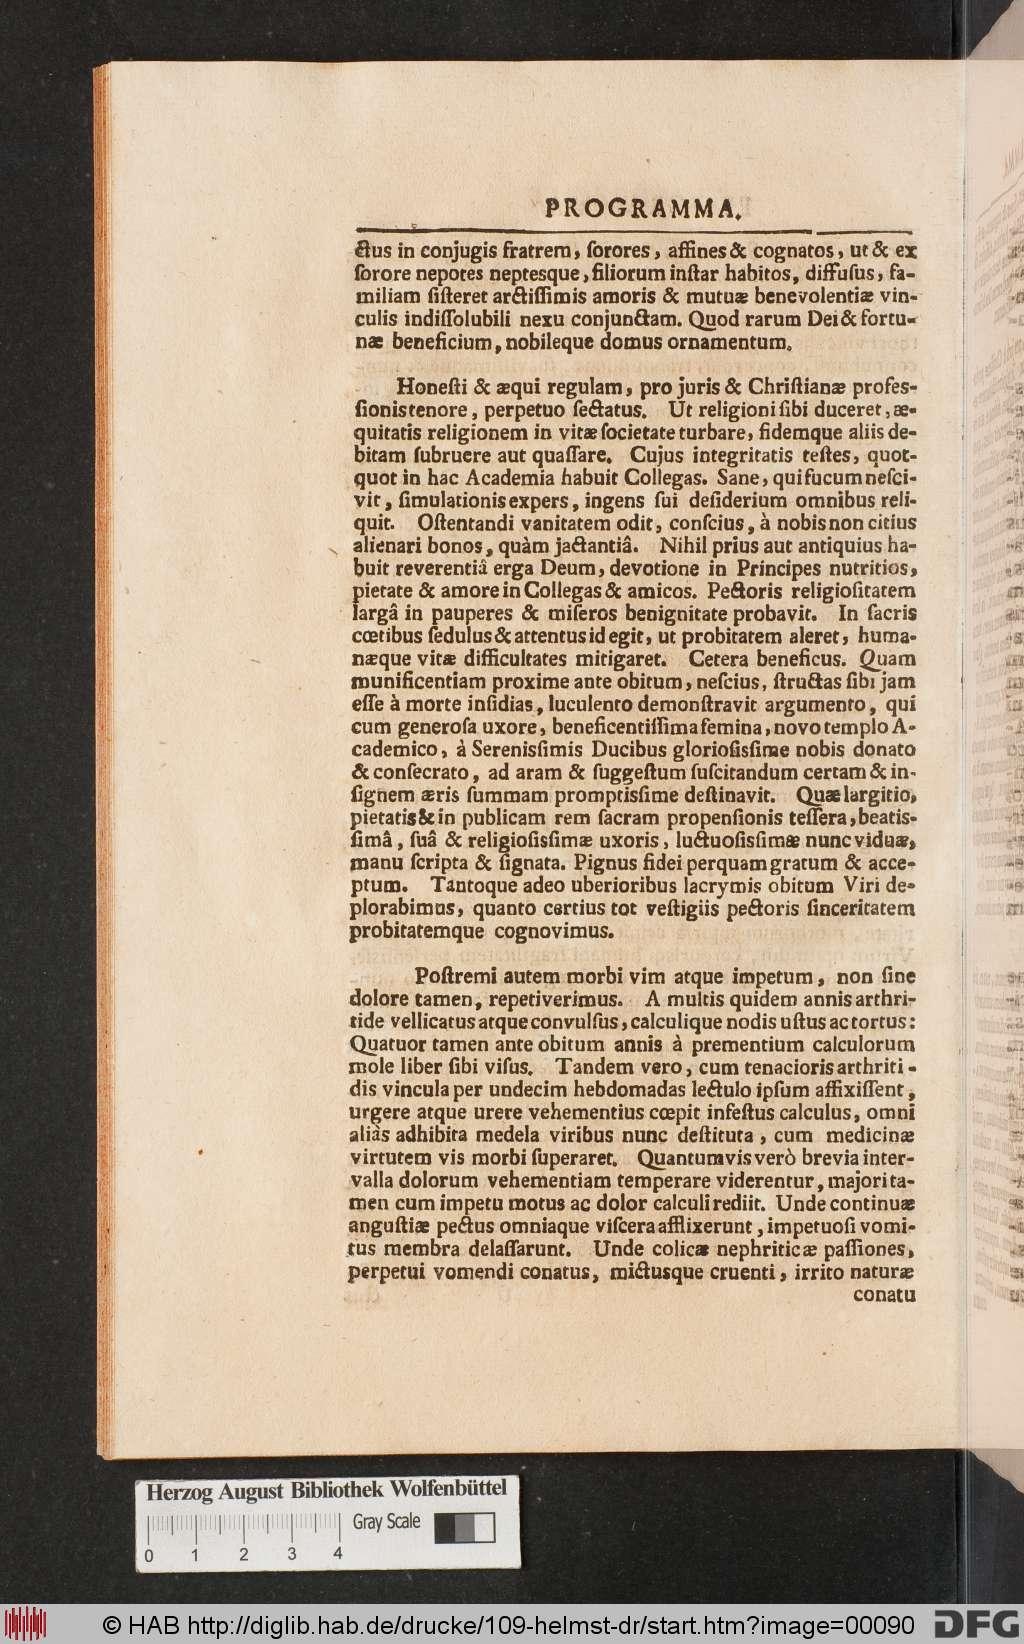 http://diglib.hab.de/drucke/109-helmst-dr/00090.jpg